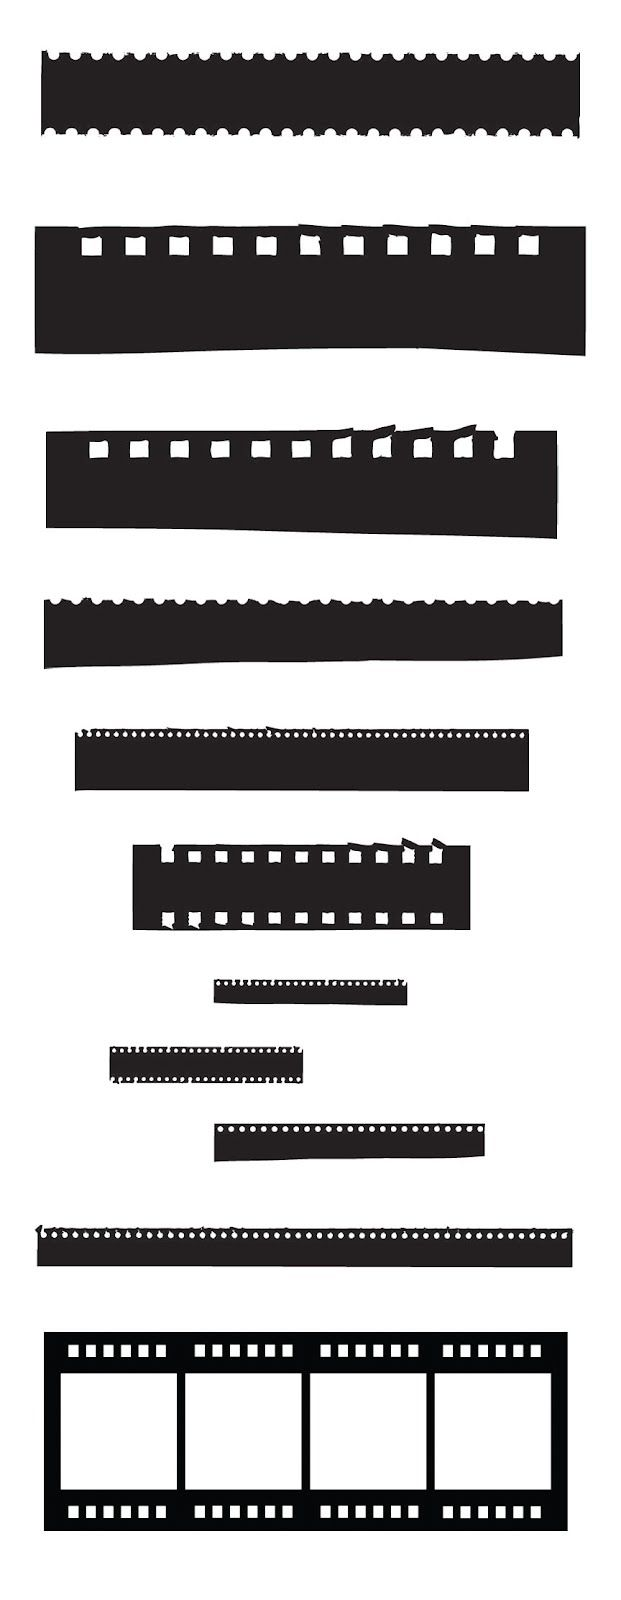 KLDezign les SVG: Des films Auf lessvgdekldezign.blogspot.ca http://www.pinterest.com/livelys/digital-products-tutorials/